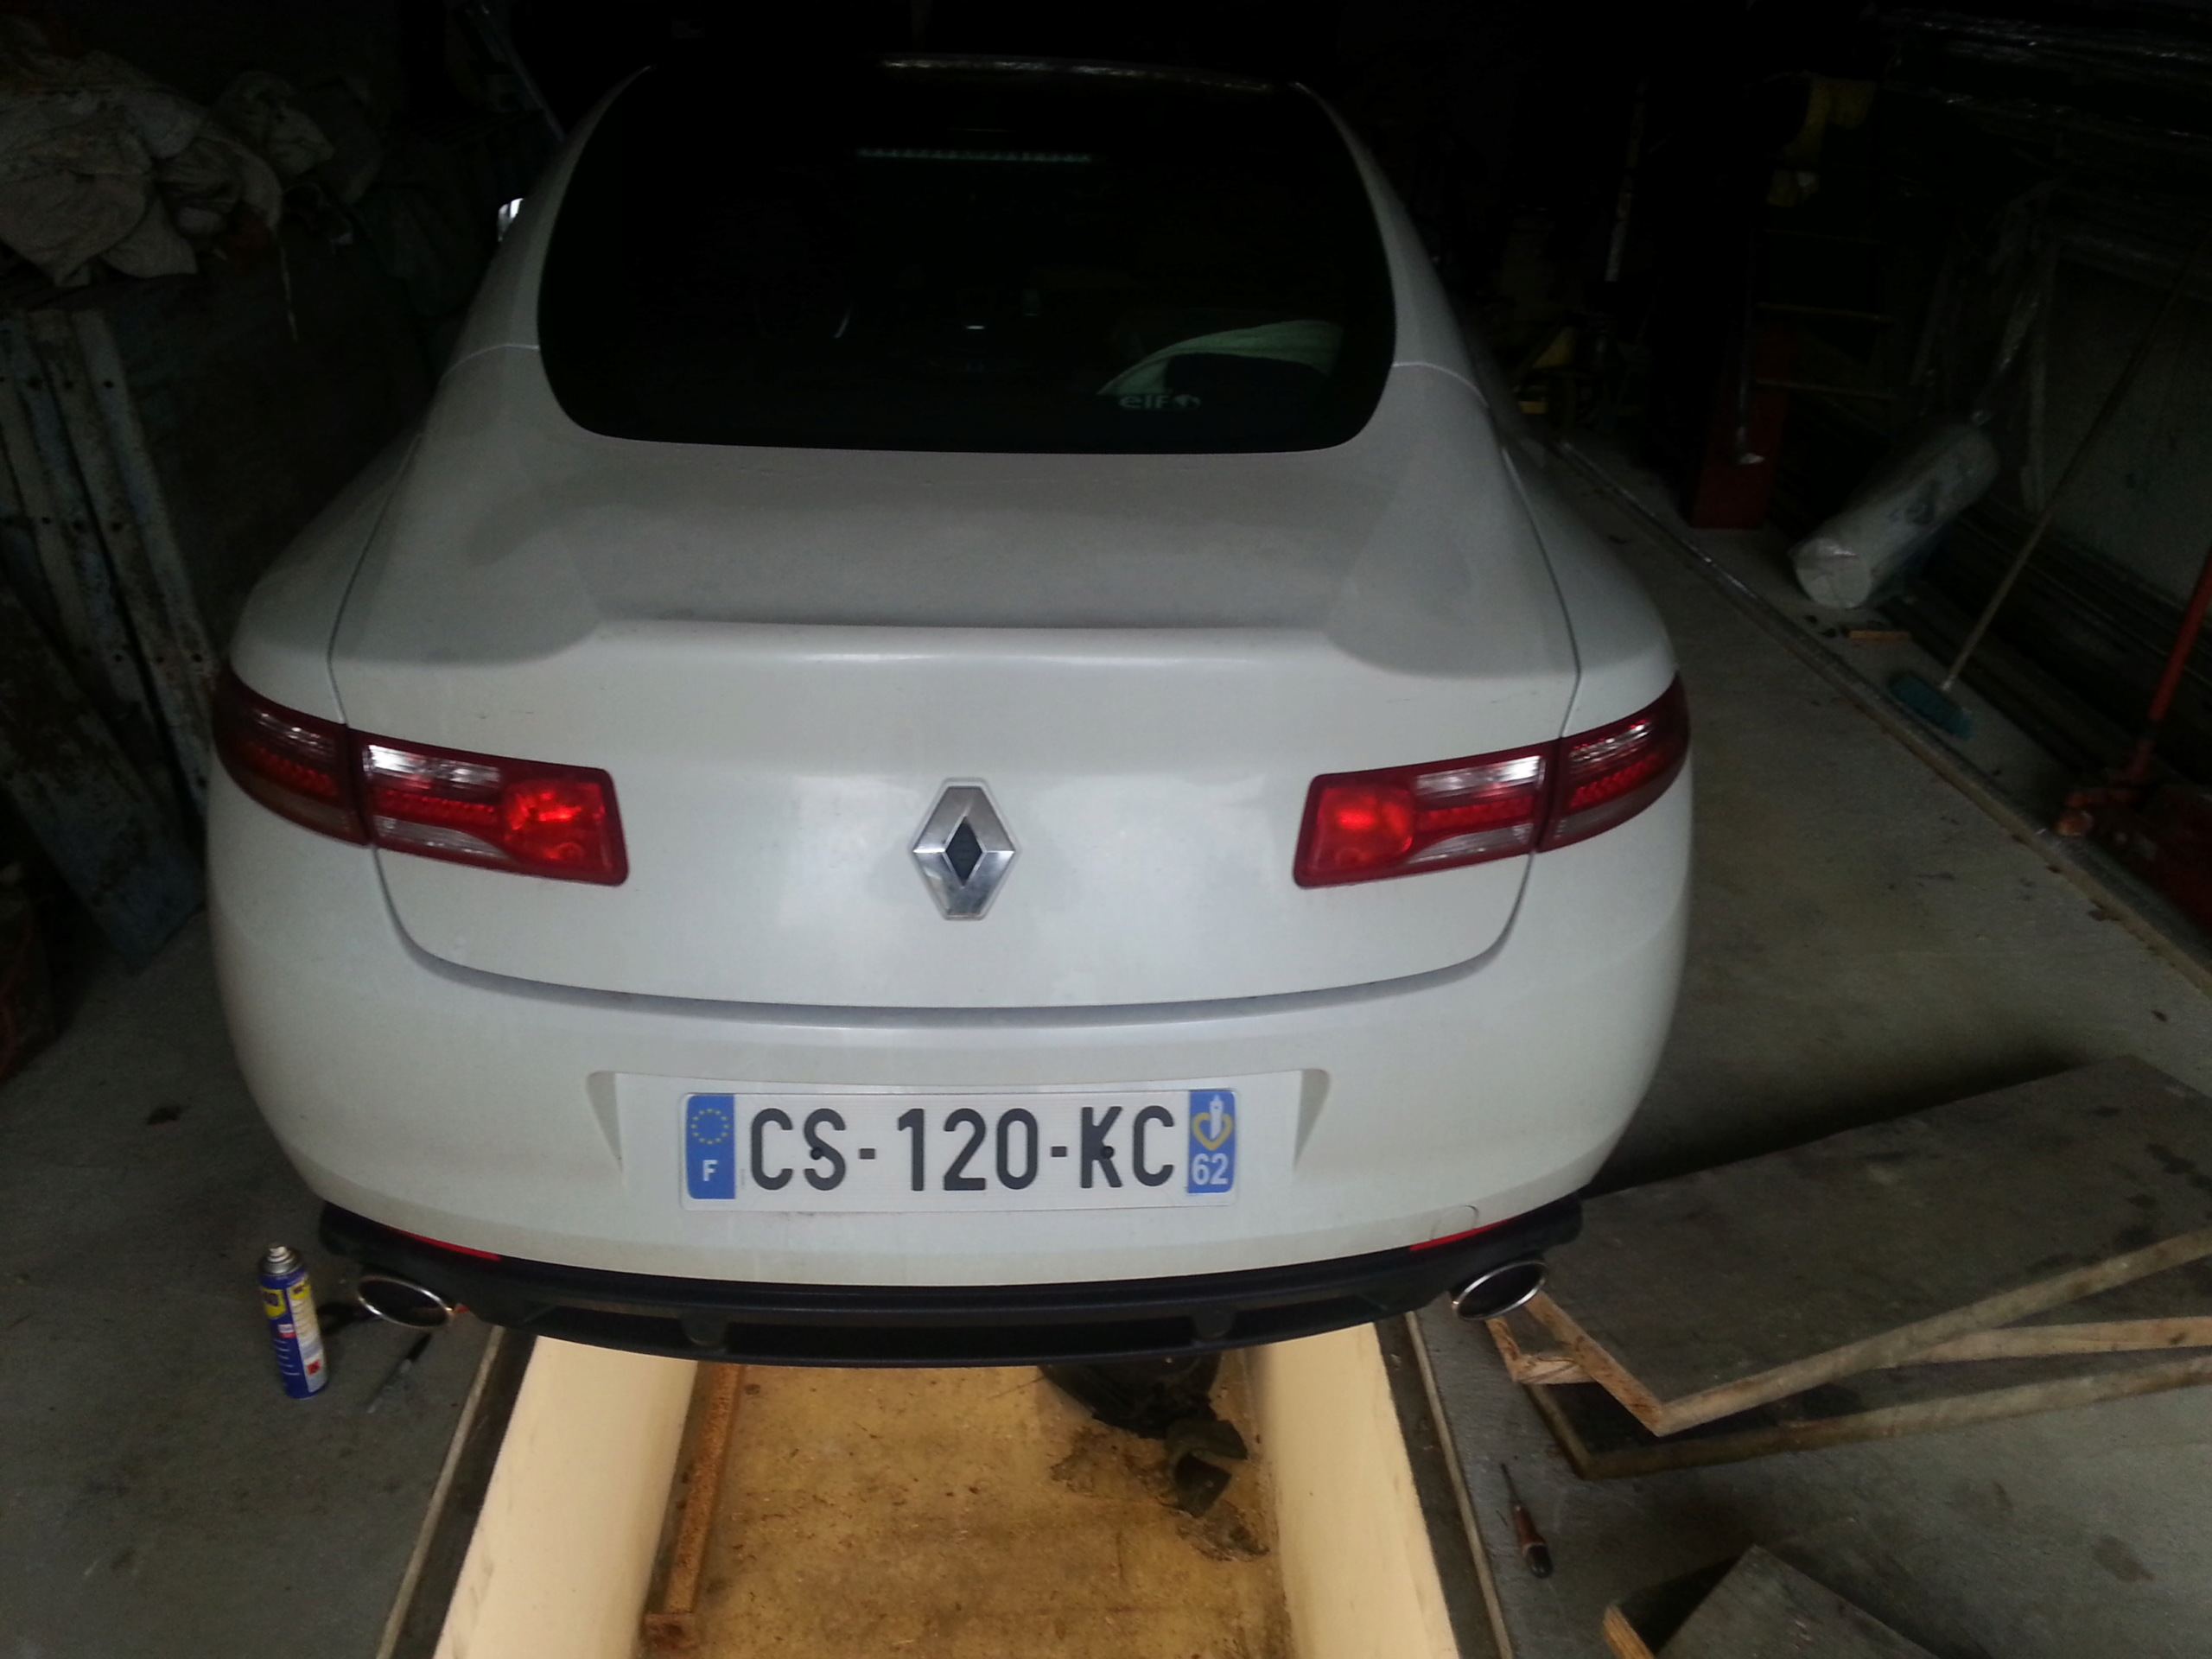 [Cédric68] Laguna III coupé GT 4Control 2,0 dCi 180  - Page 10 20131214